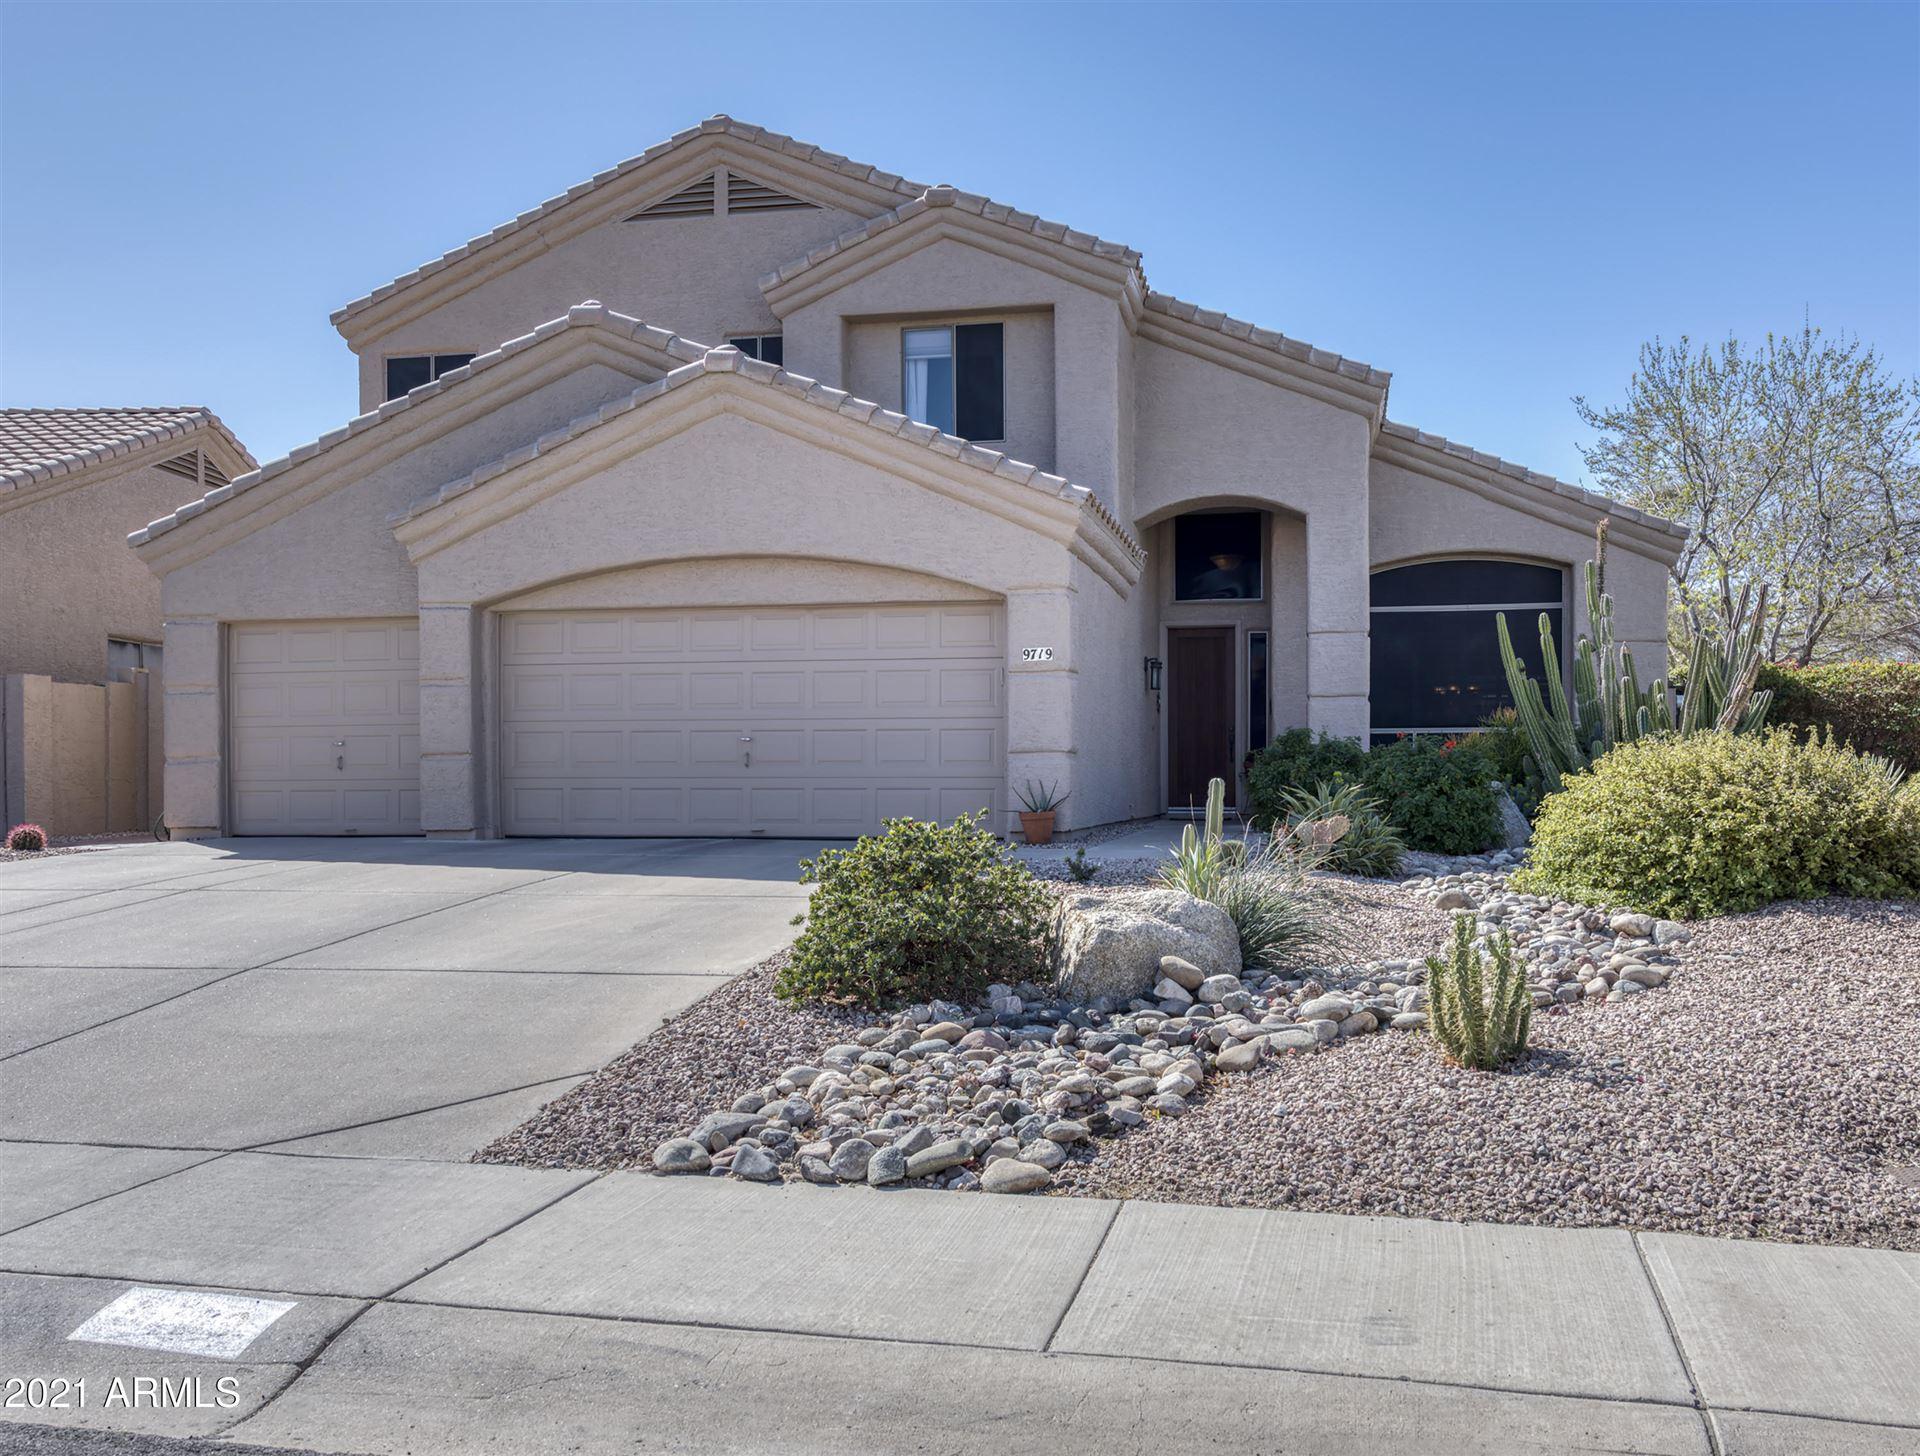 9719 E PINE VALLEY Road, Scottsdale, AZ 85260 - MLS#: 6200427